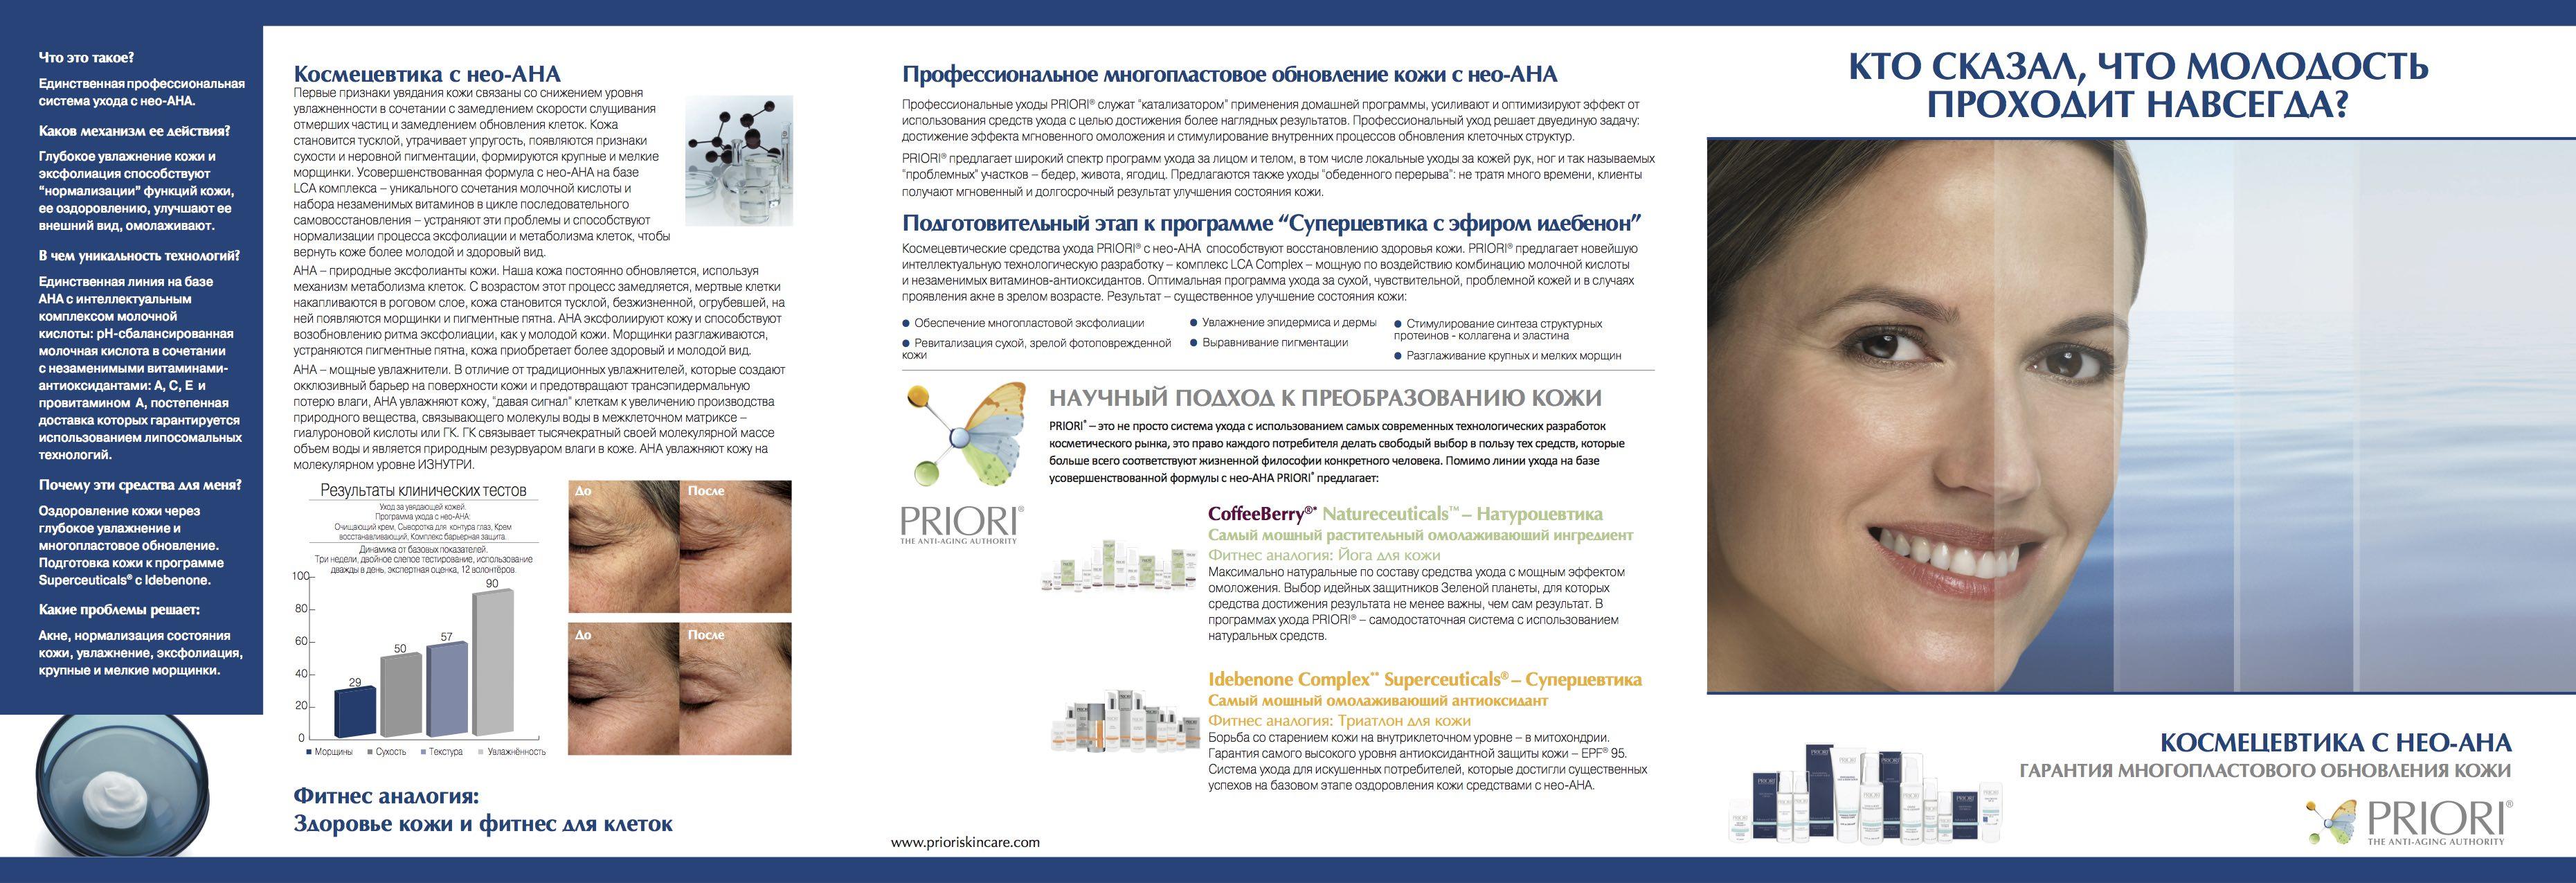 Rus_Advanced_AHA1.jpg